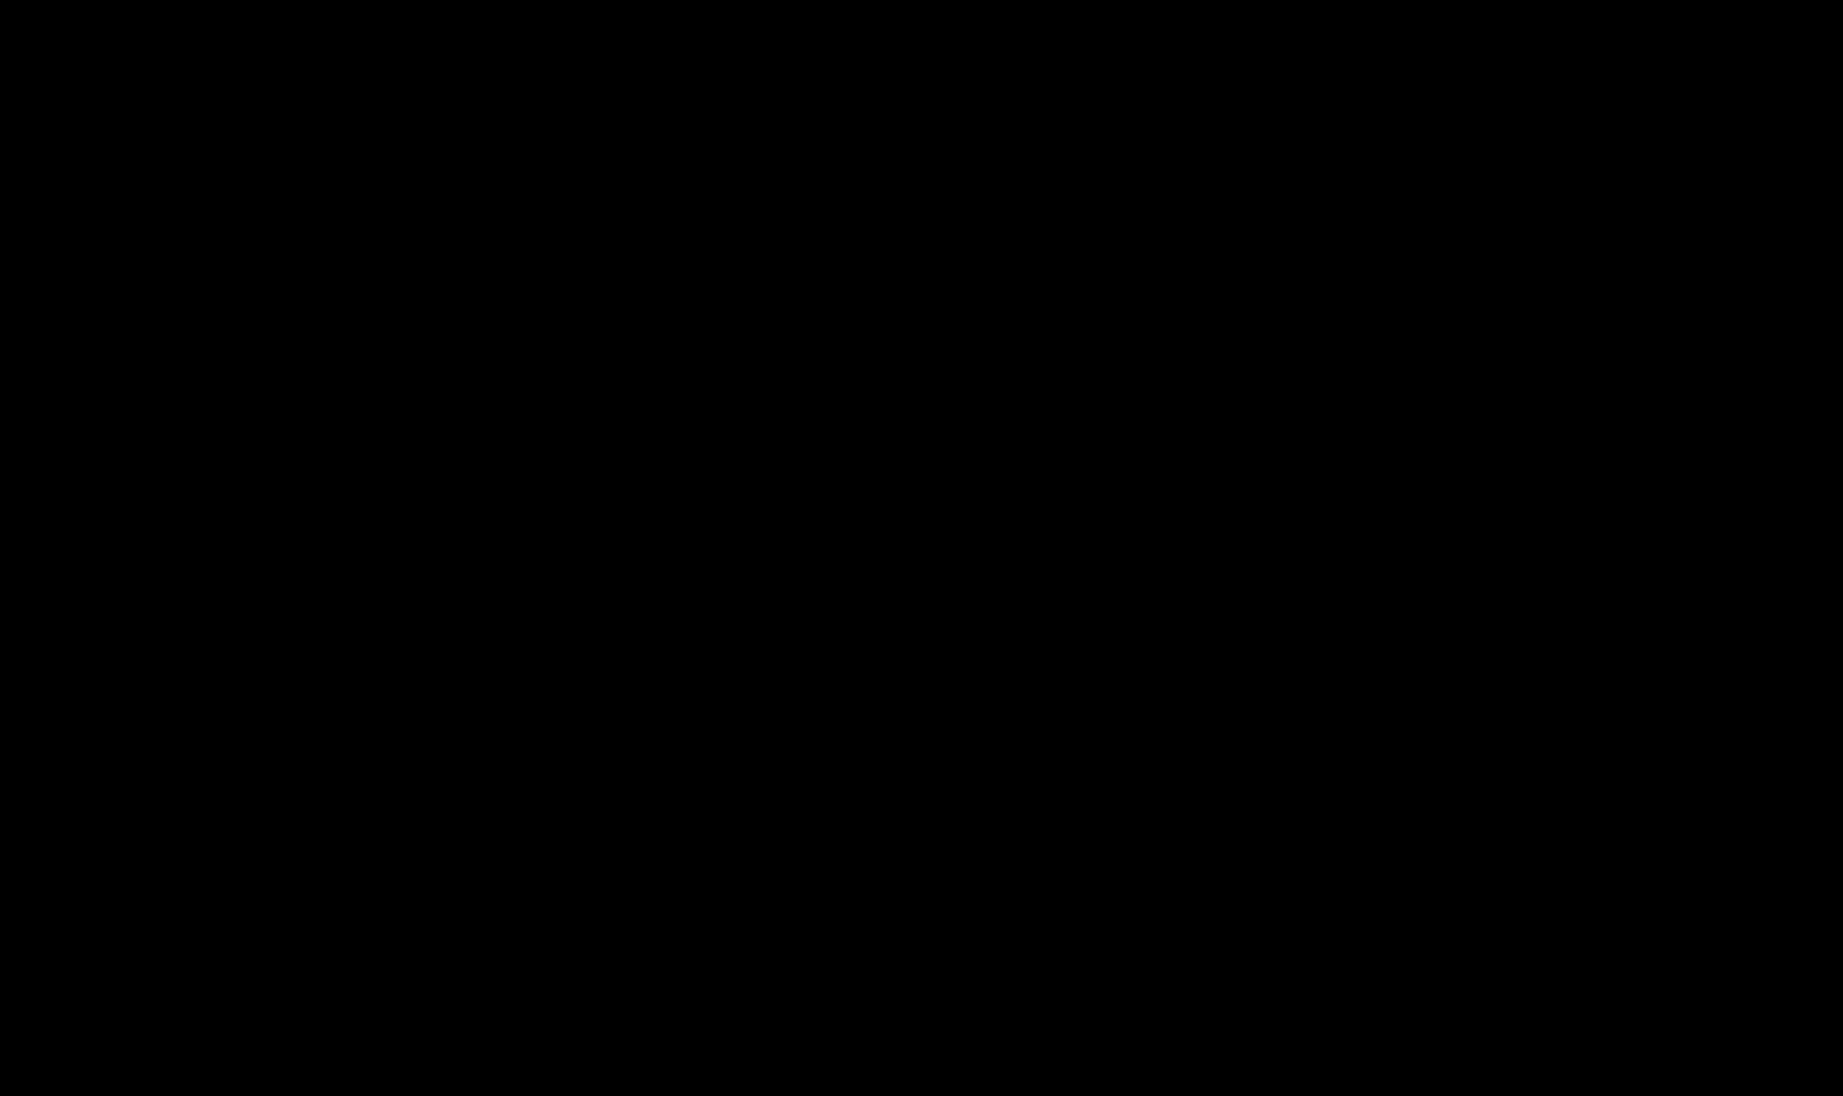 MAL-dPEG®₁₂-Tris(-dPEG®₂₄-acid)₃